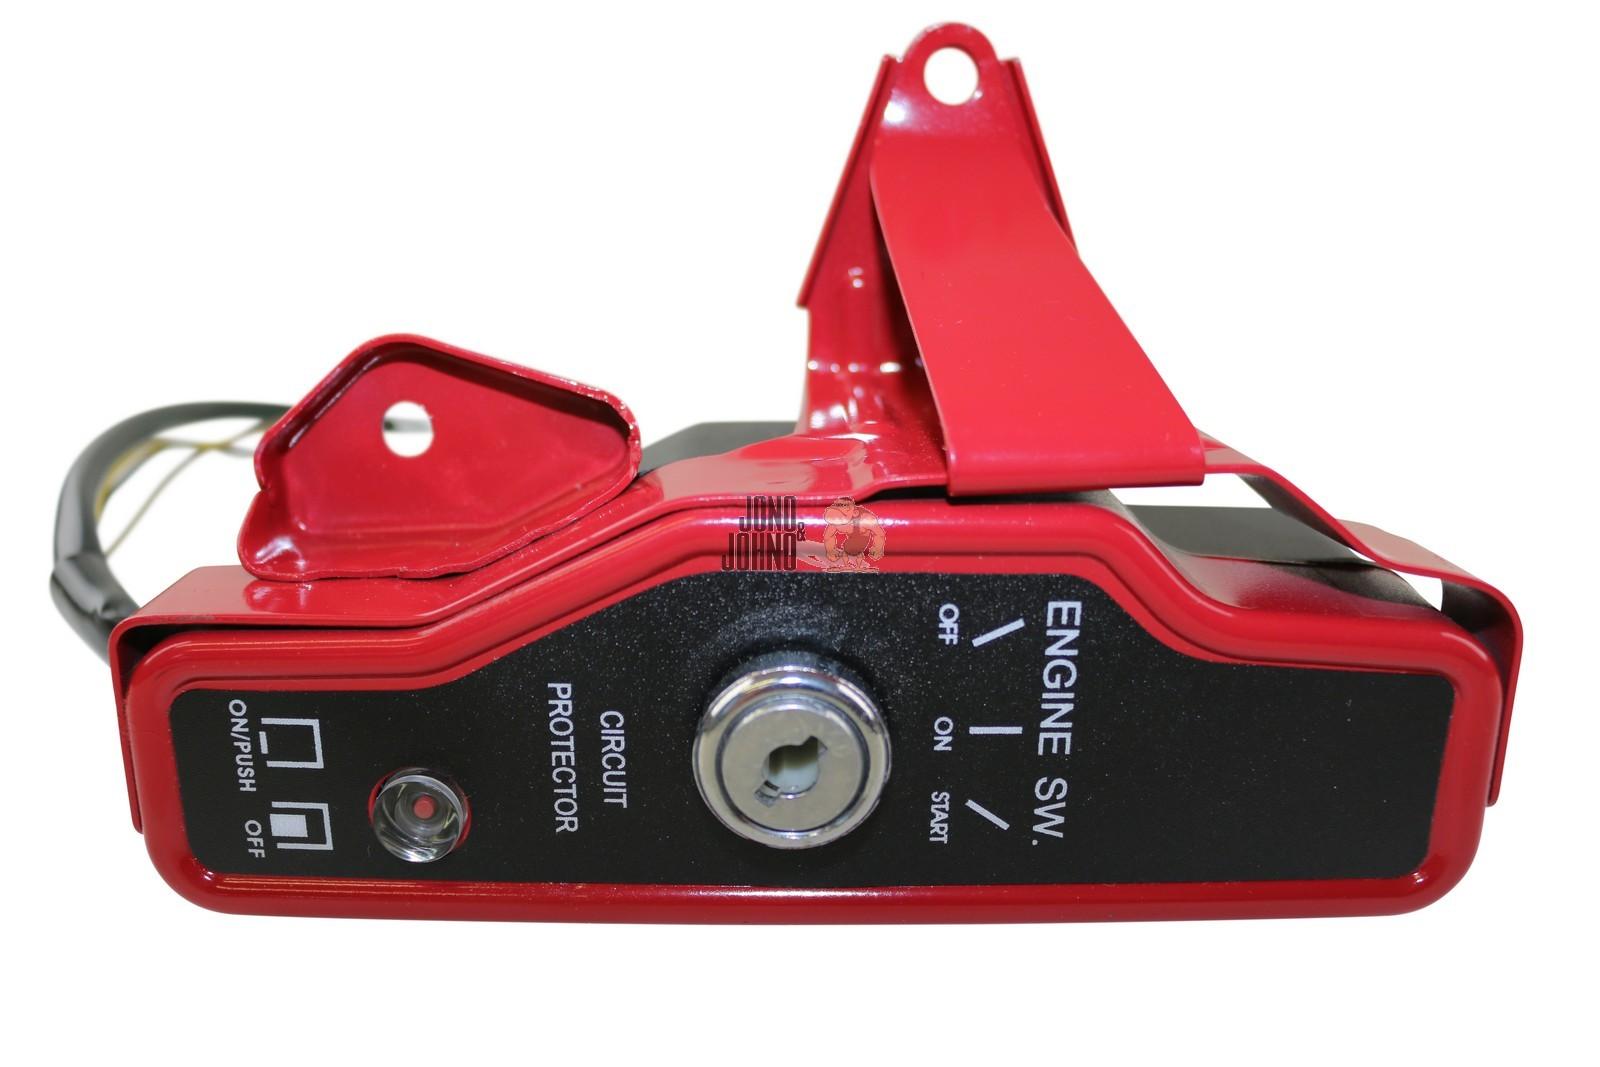 ignition switch key panel electric start 4 honda gx160 5. Black Bedroom Furniture Sets. Home Design Ideas